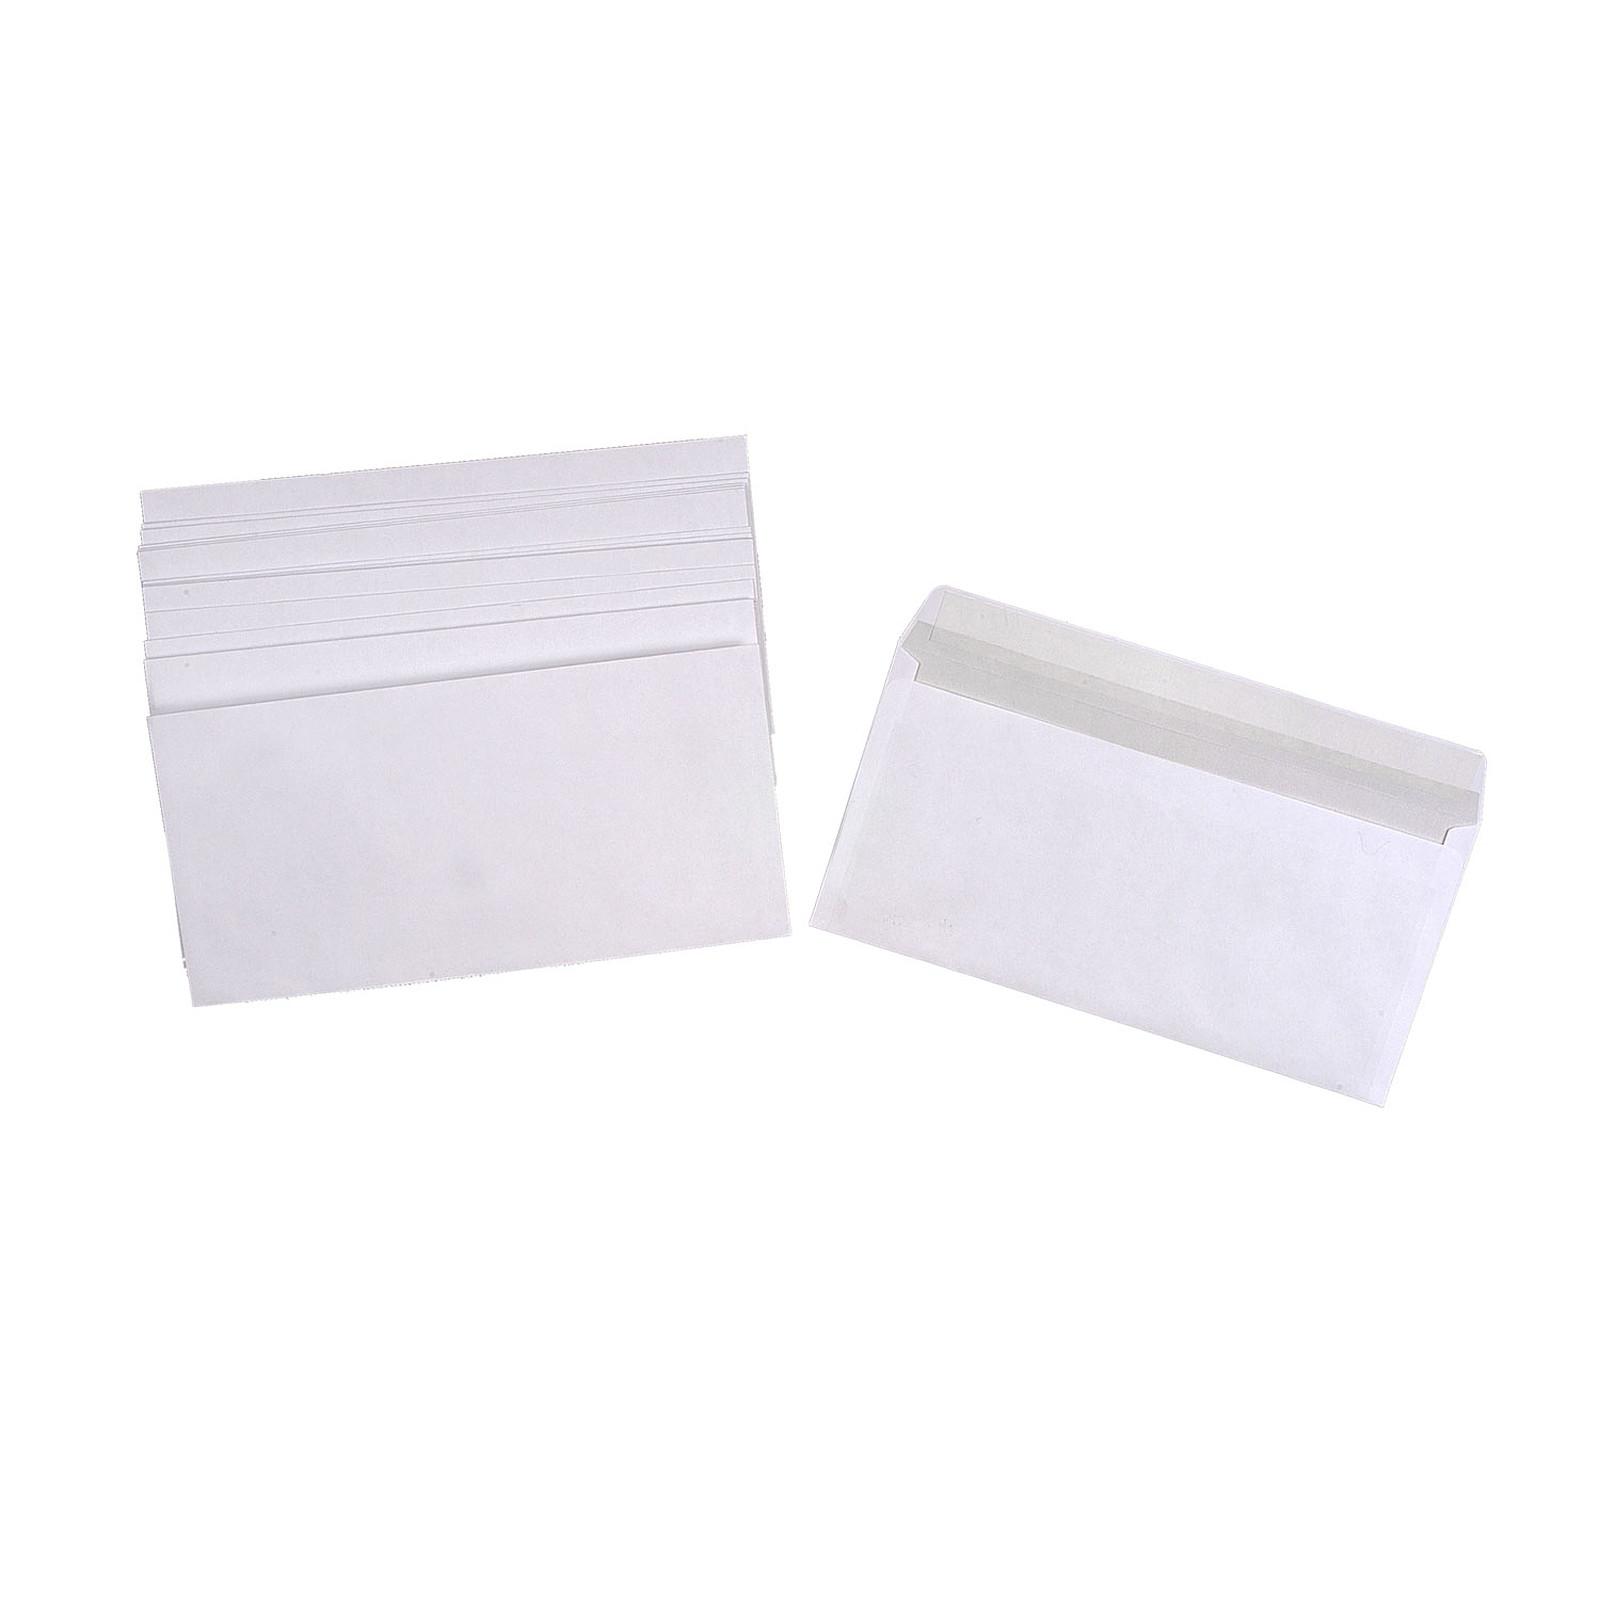 500 enveloppes DL auto-adhésives 80g pleine